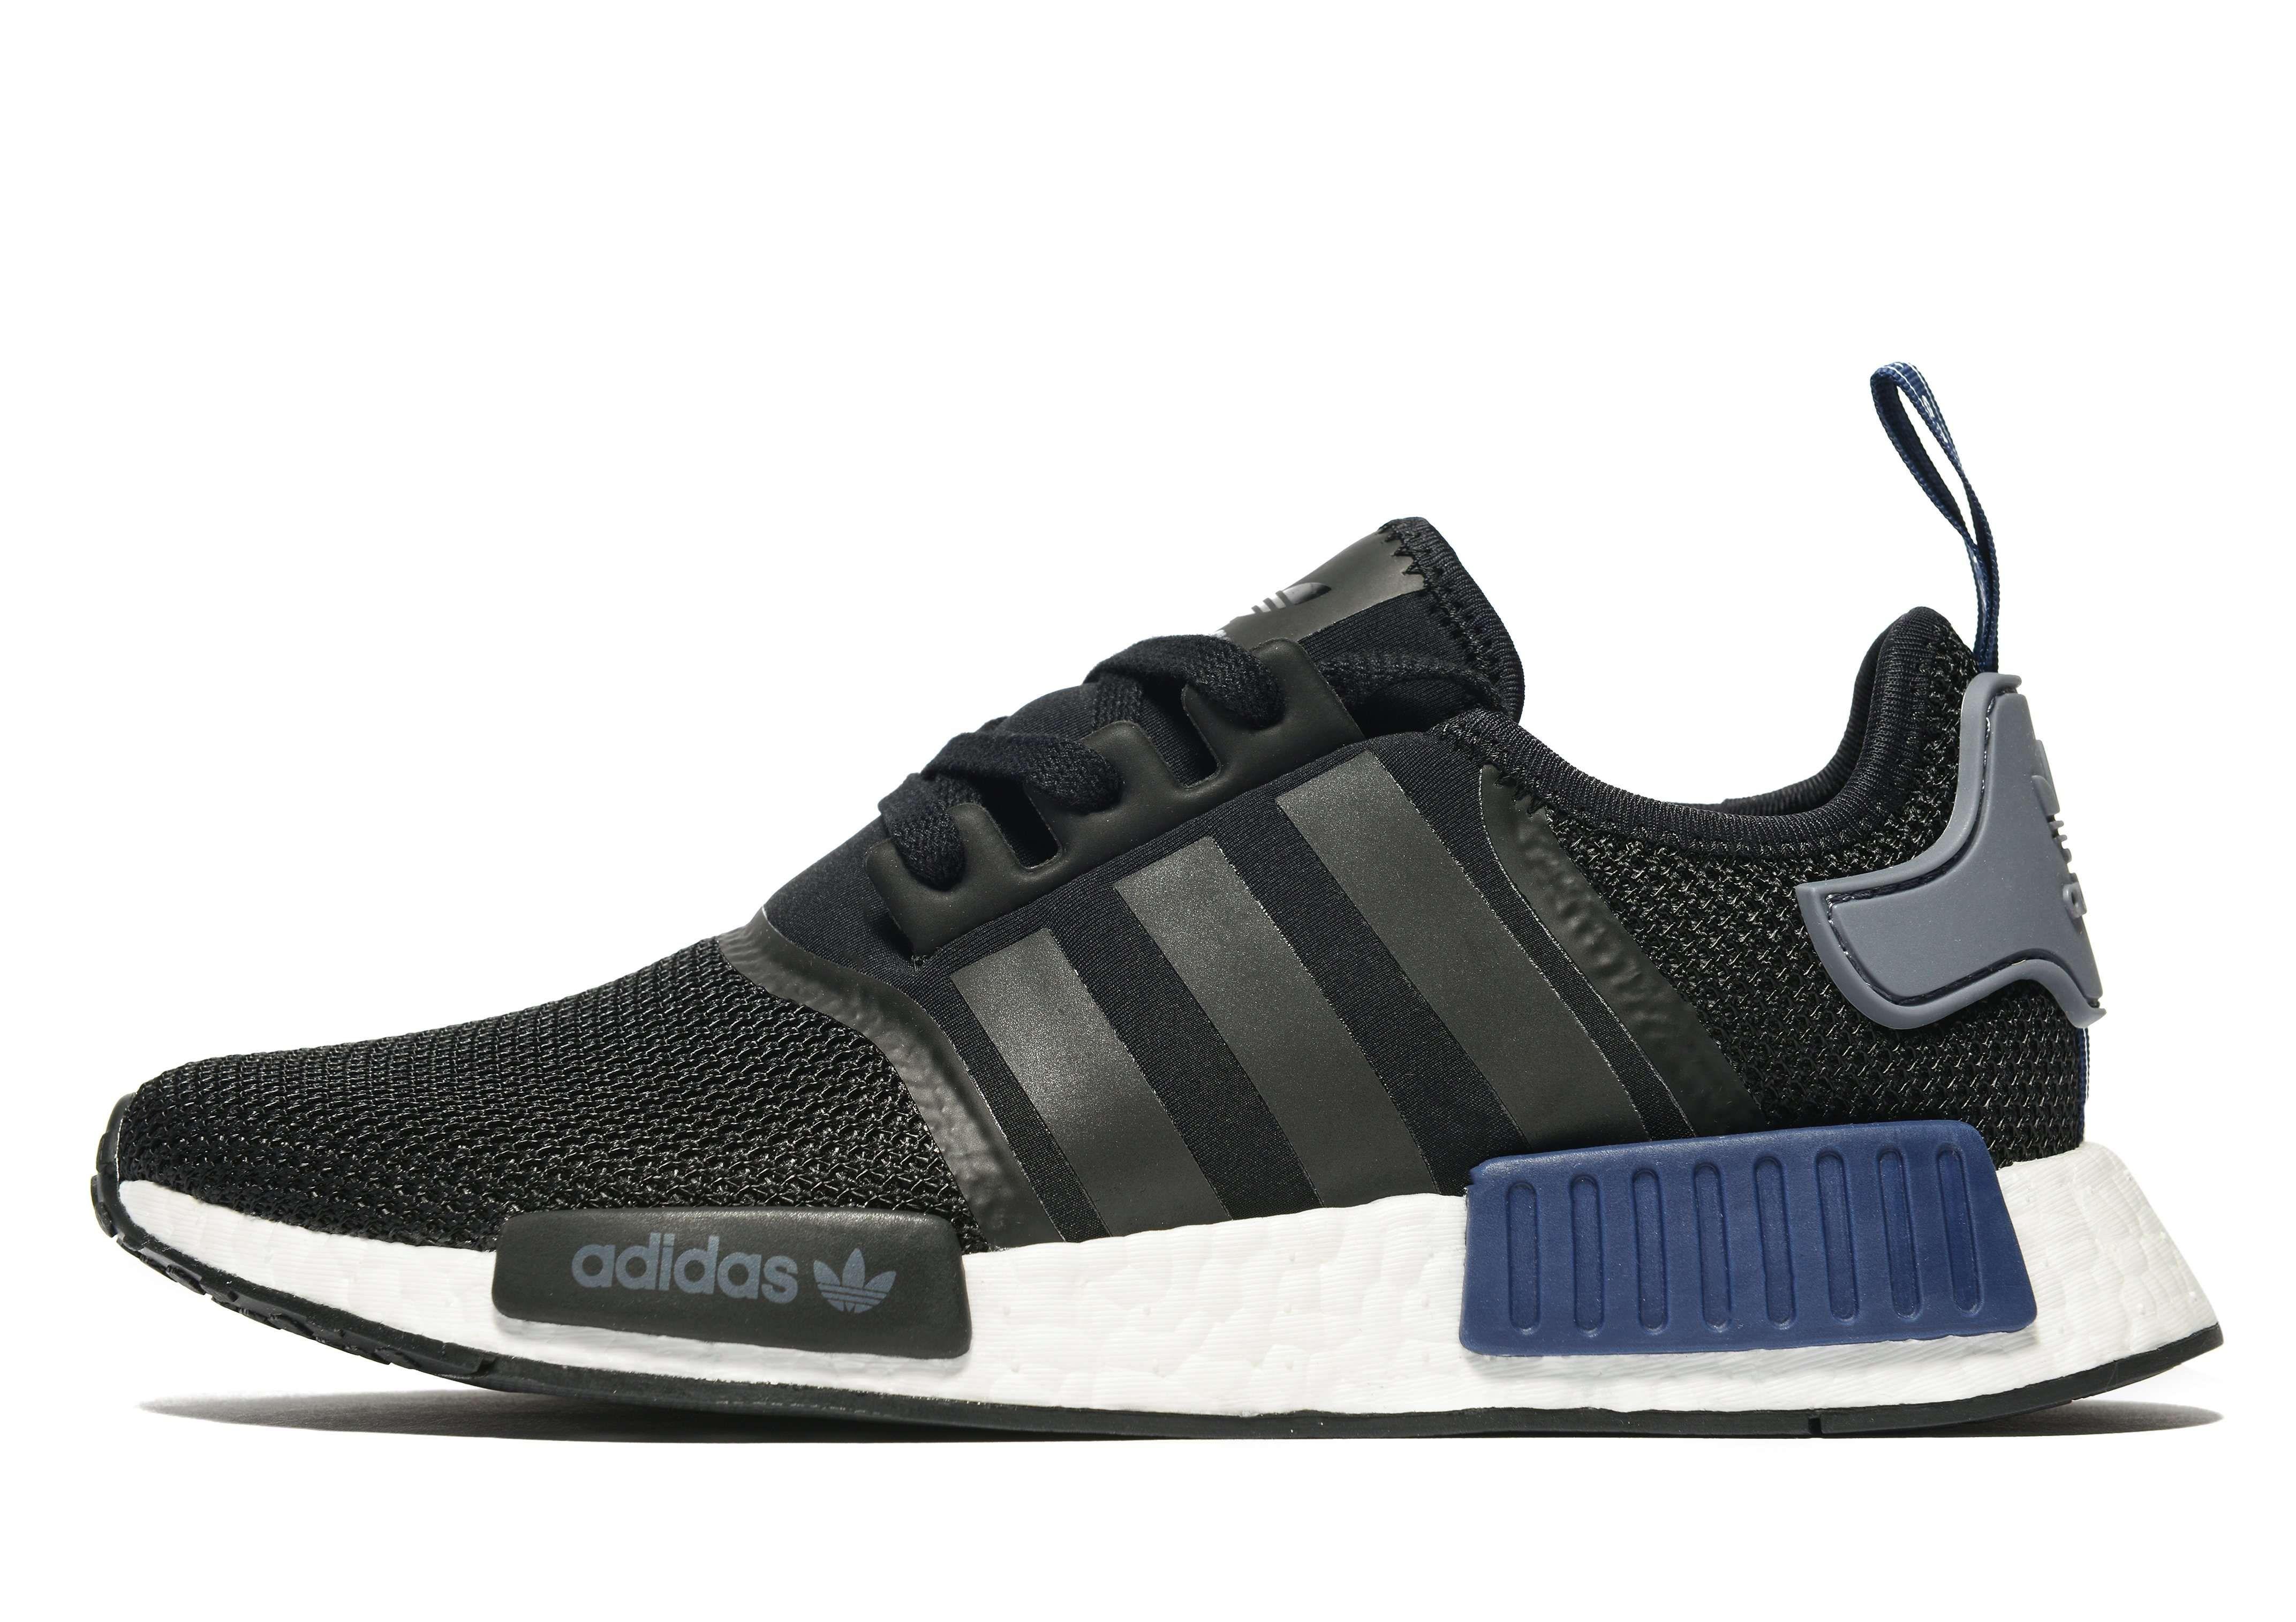 adidas shoes jd sale